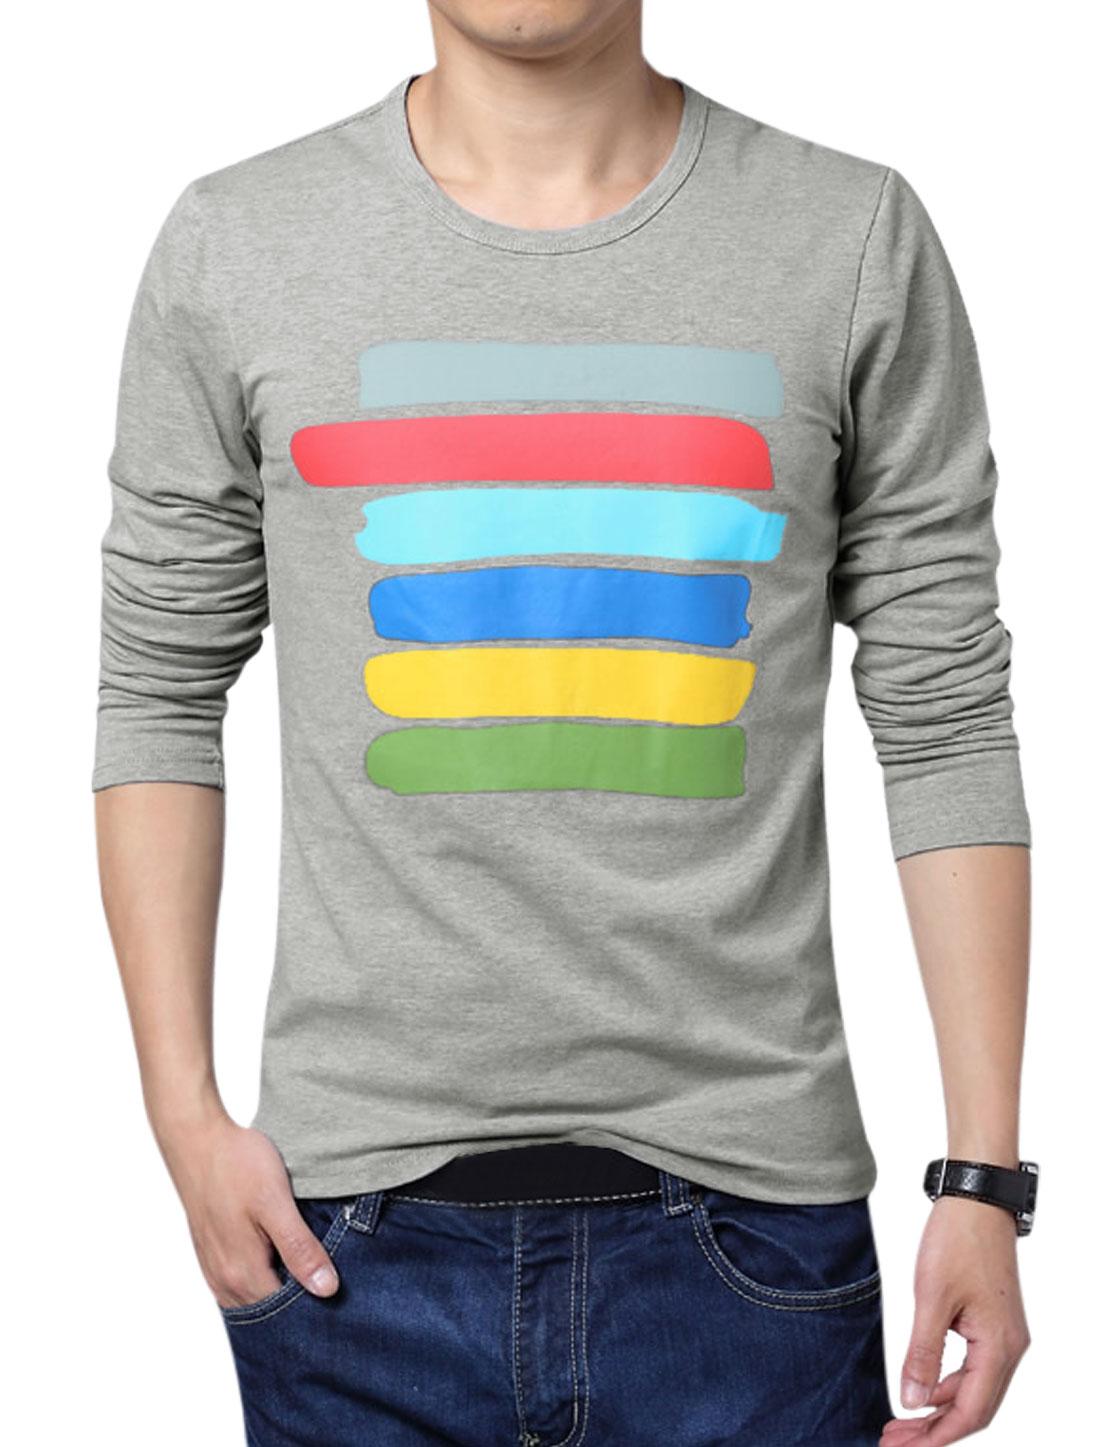 Men Long Sleeve Colorful Stripes Stylish T-Shirt Gray L